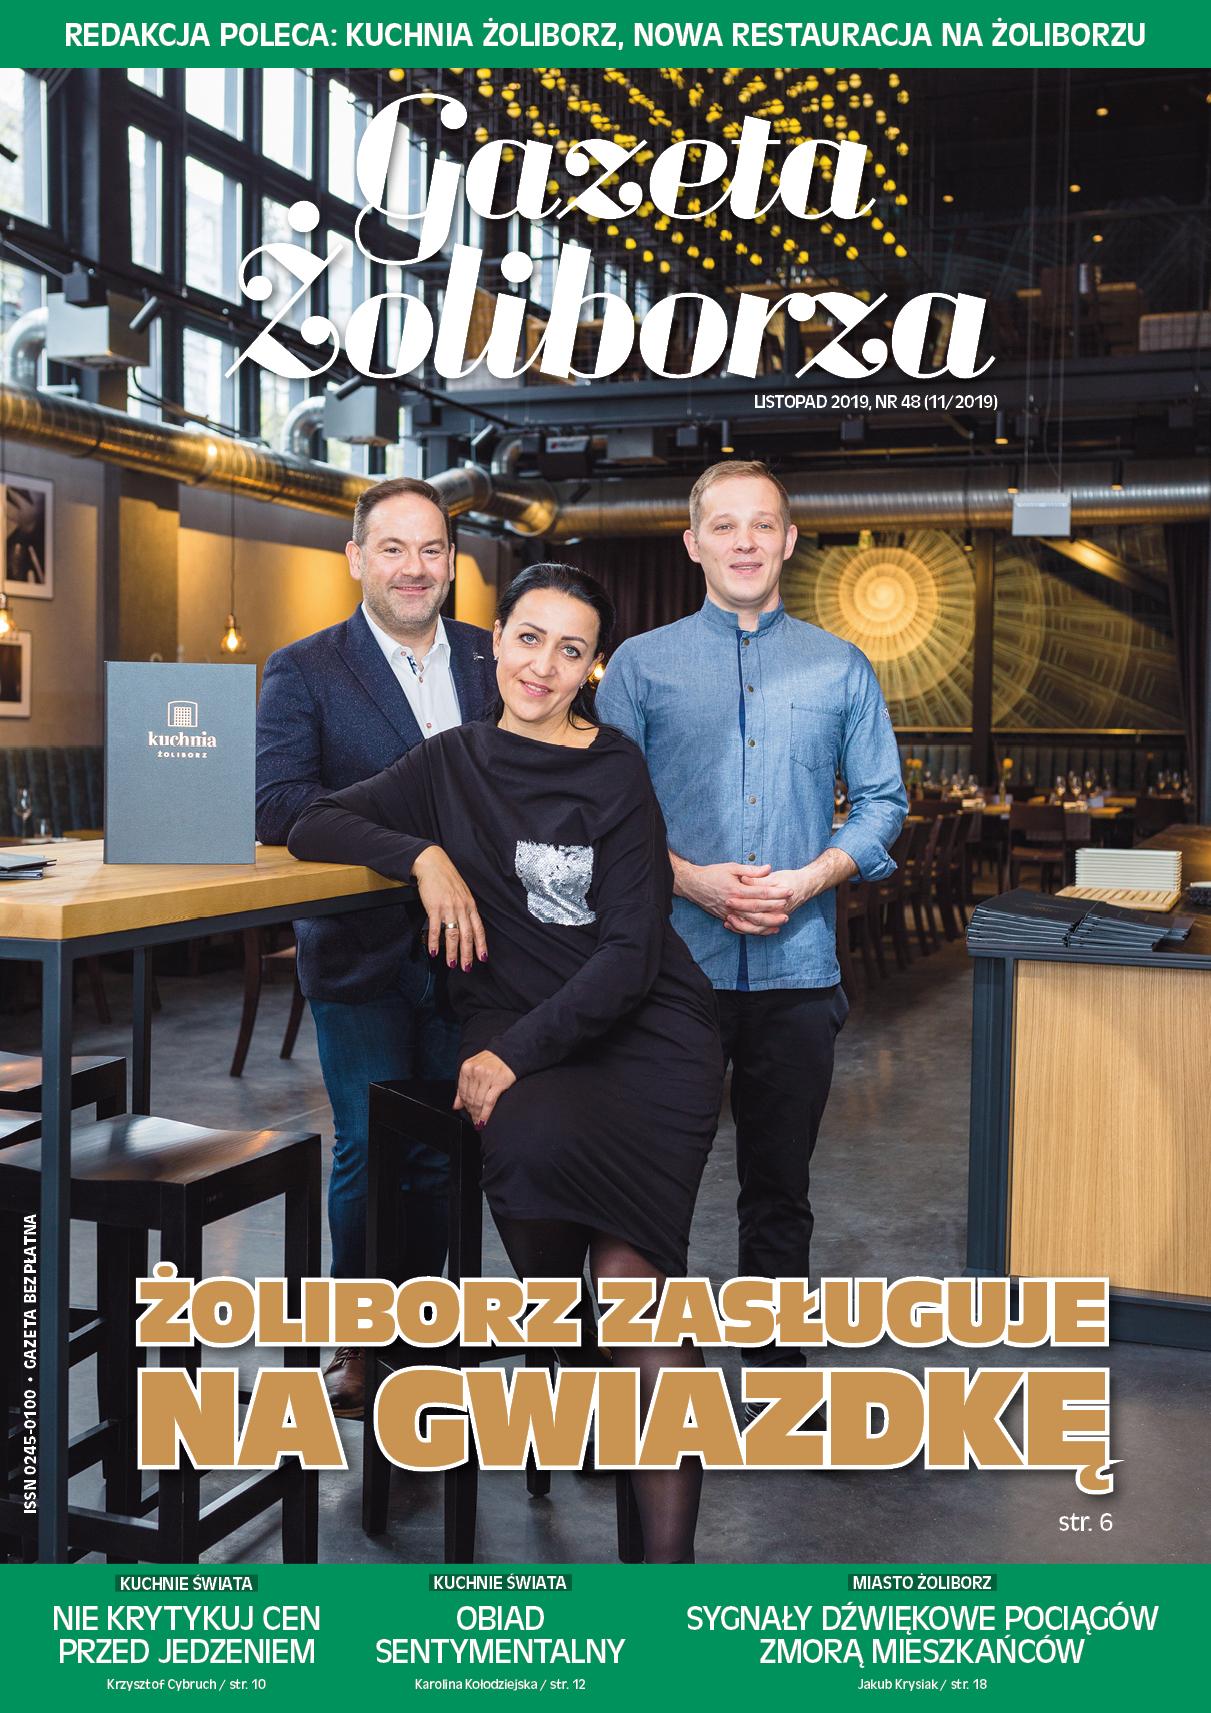 Gazeta Żoliborza - 11/2019 (48)